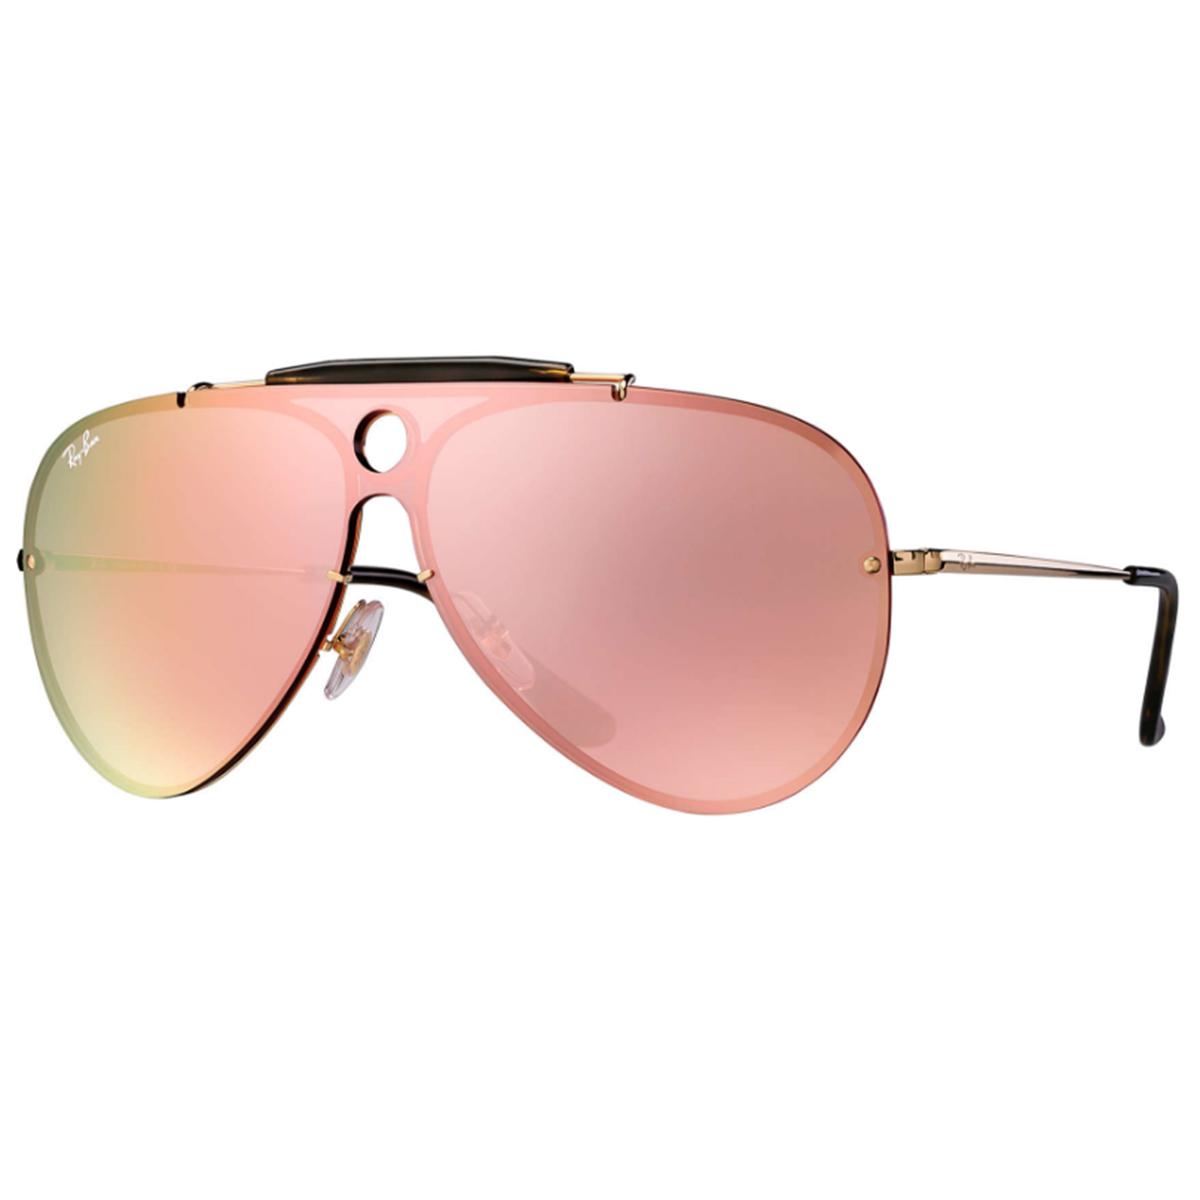 Compre Óculos de Sol Ray Ban Blaze Shooter em 10X   Tri-Jóia Shop 86eeae55d7